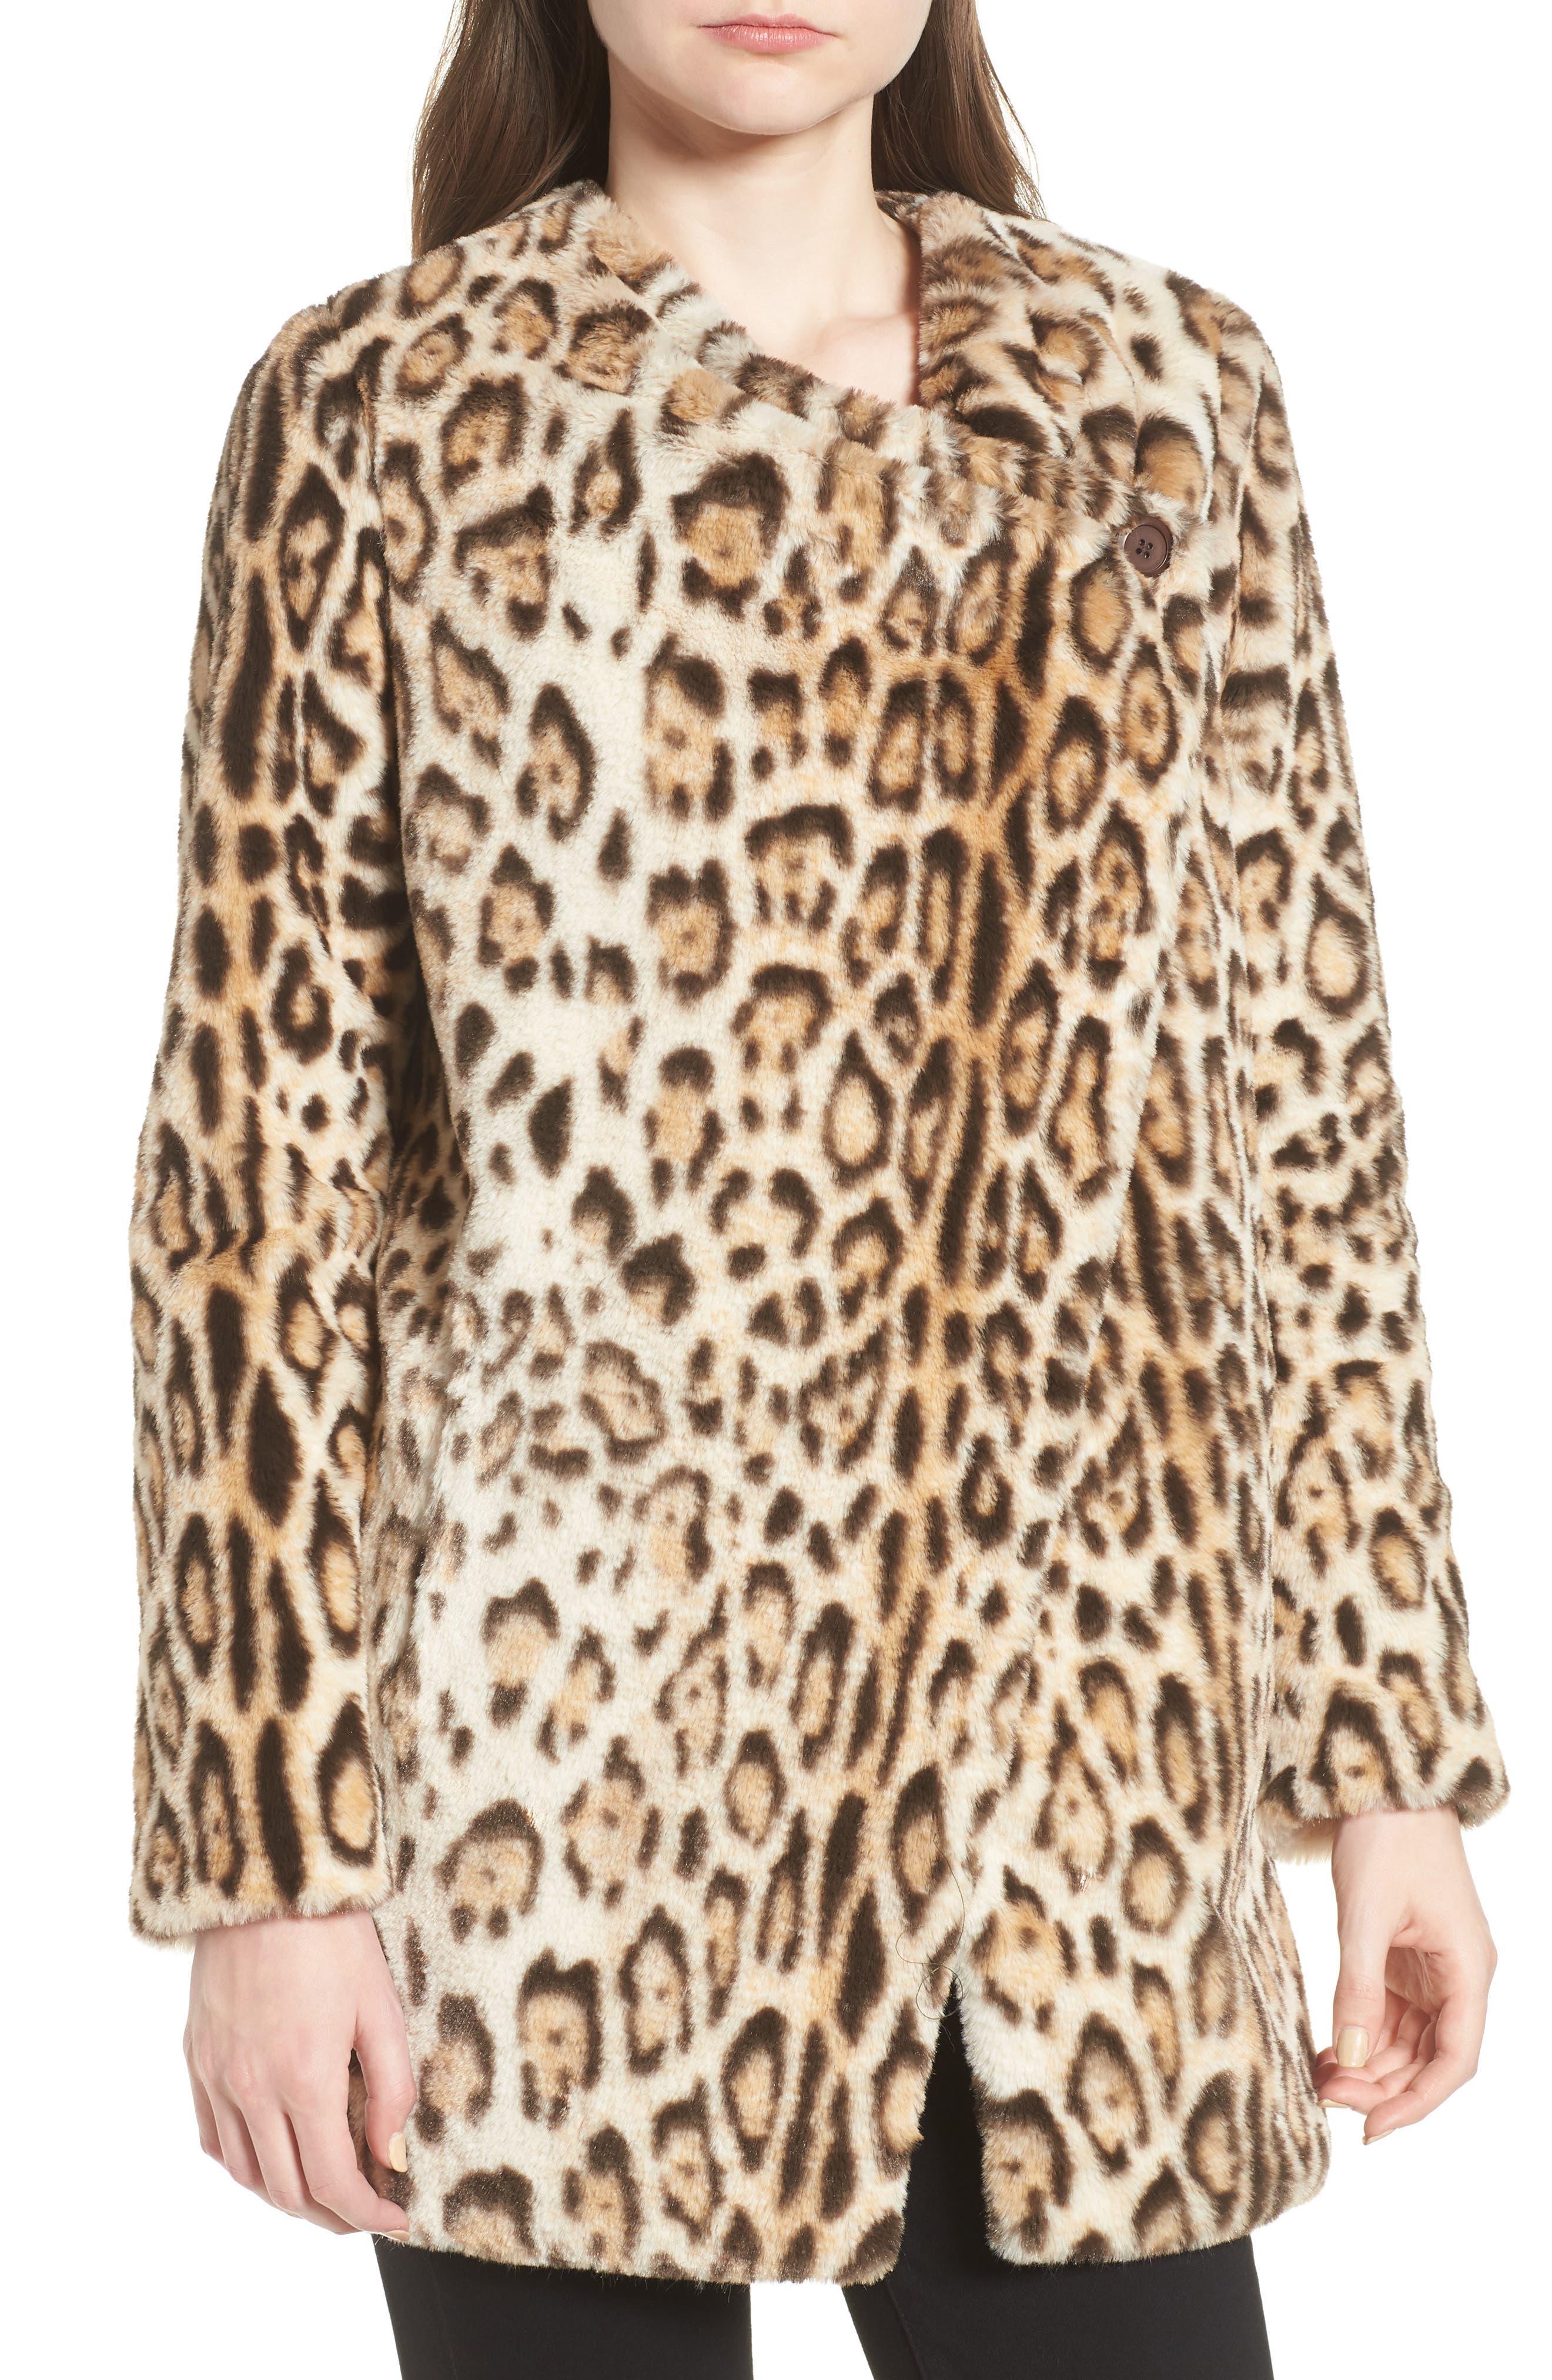 BB DAKOTA,                             Leopard Faux Fur Jacket,                             Alternate thumbnail 4, color,                             210